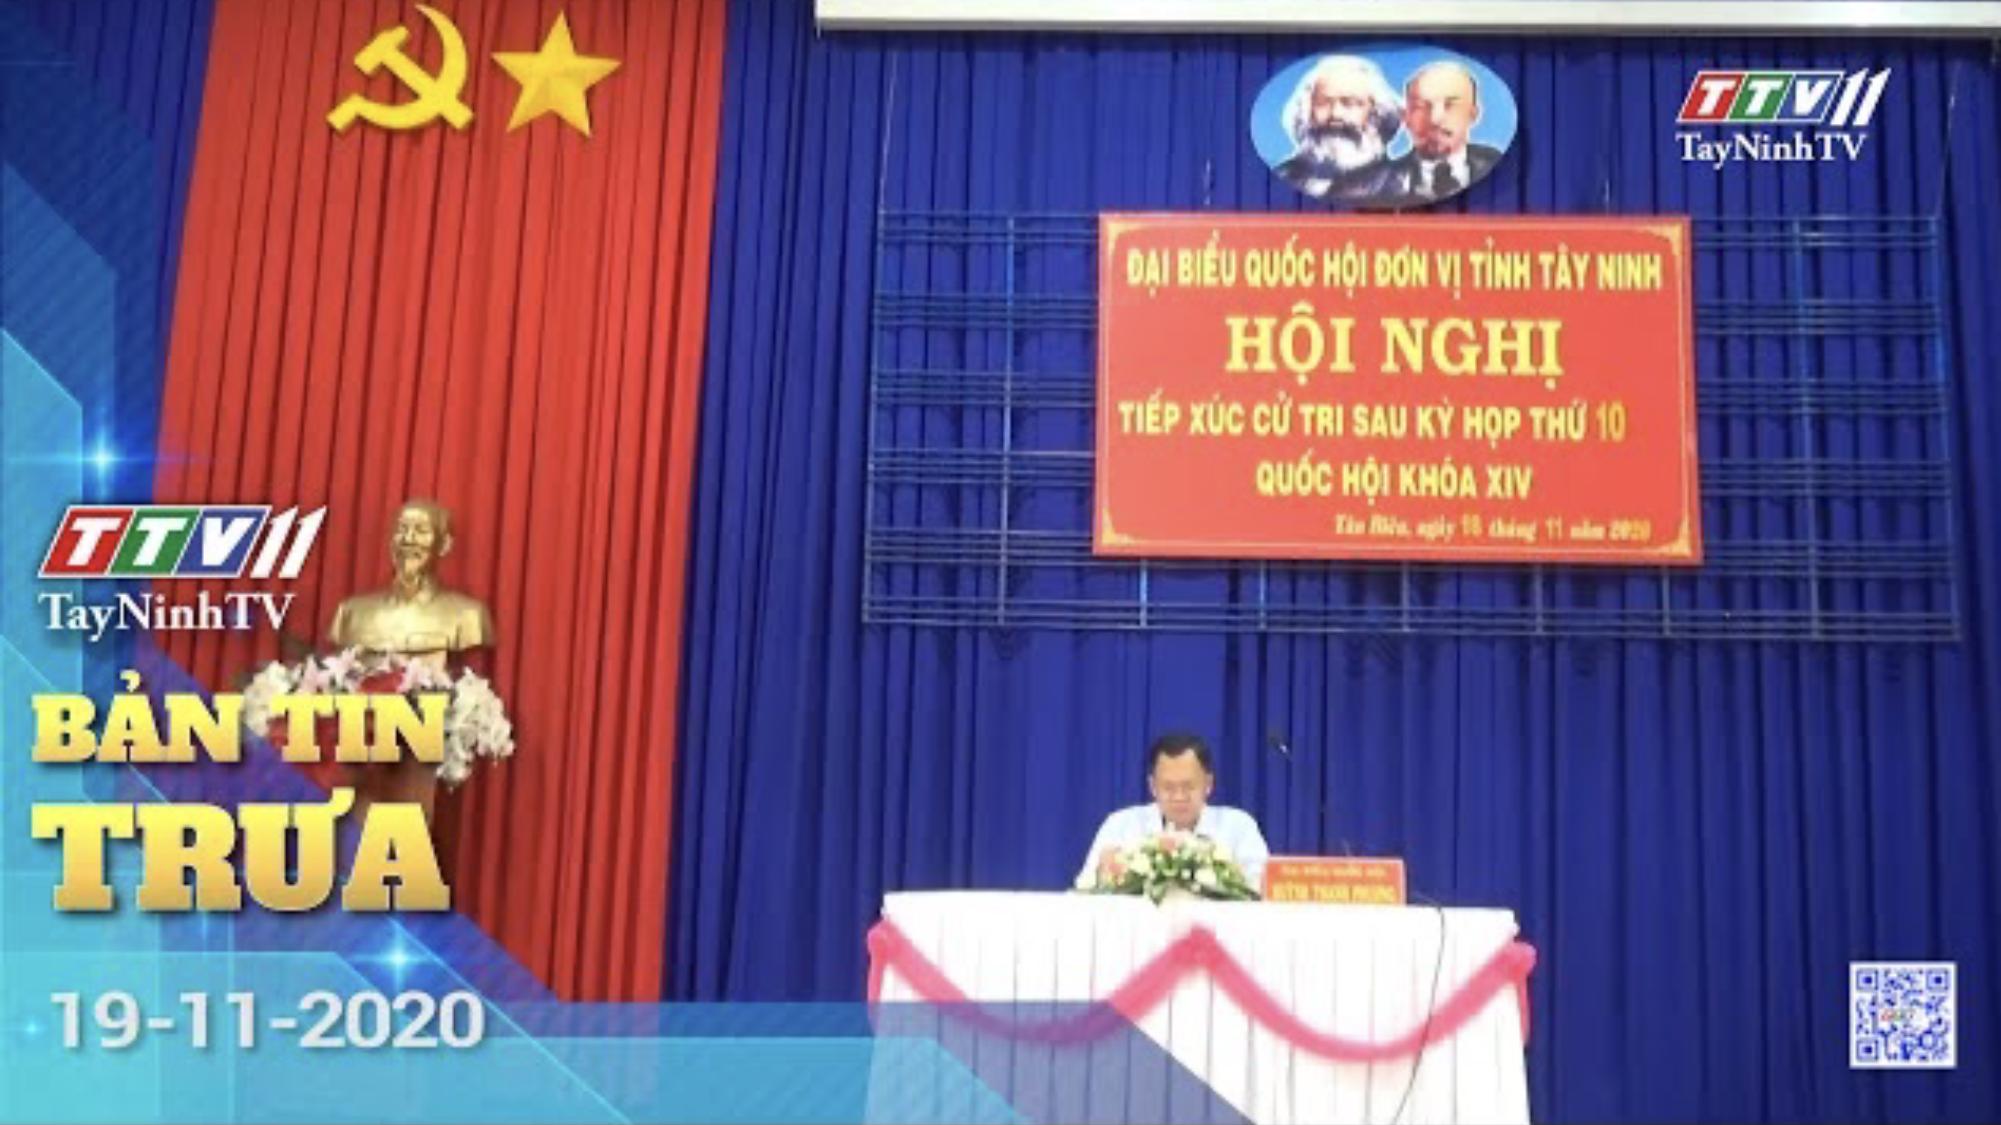 Bản tin trưa 19-11-2020 | Tin tức hôm nay | TayNinhTV